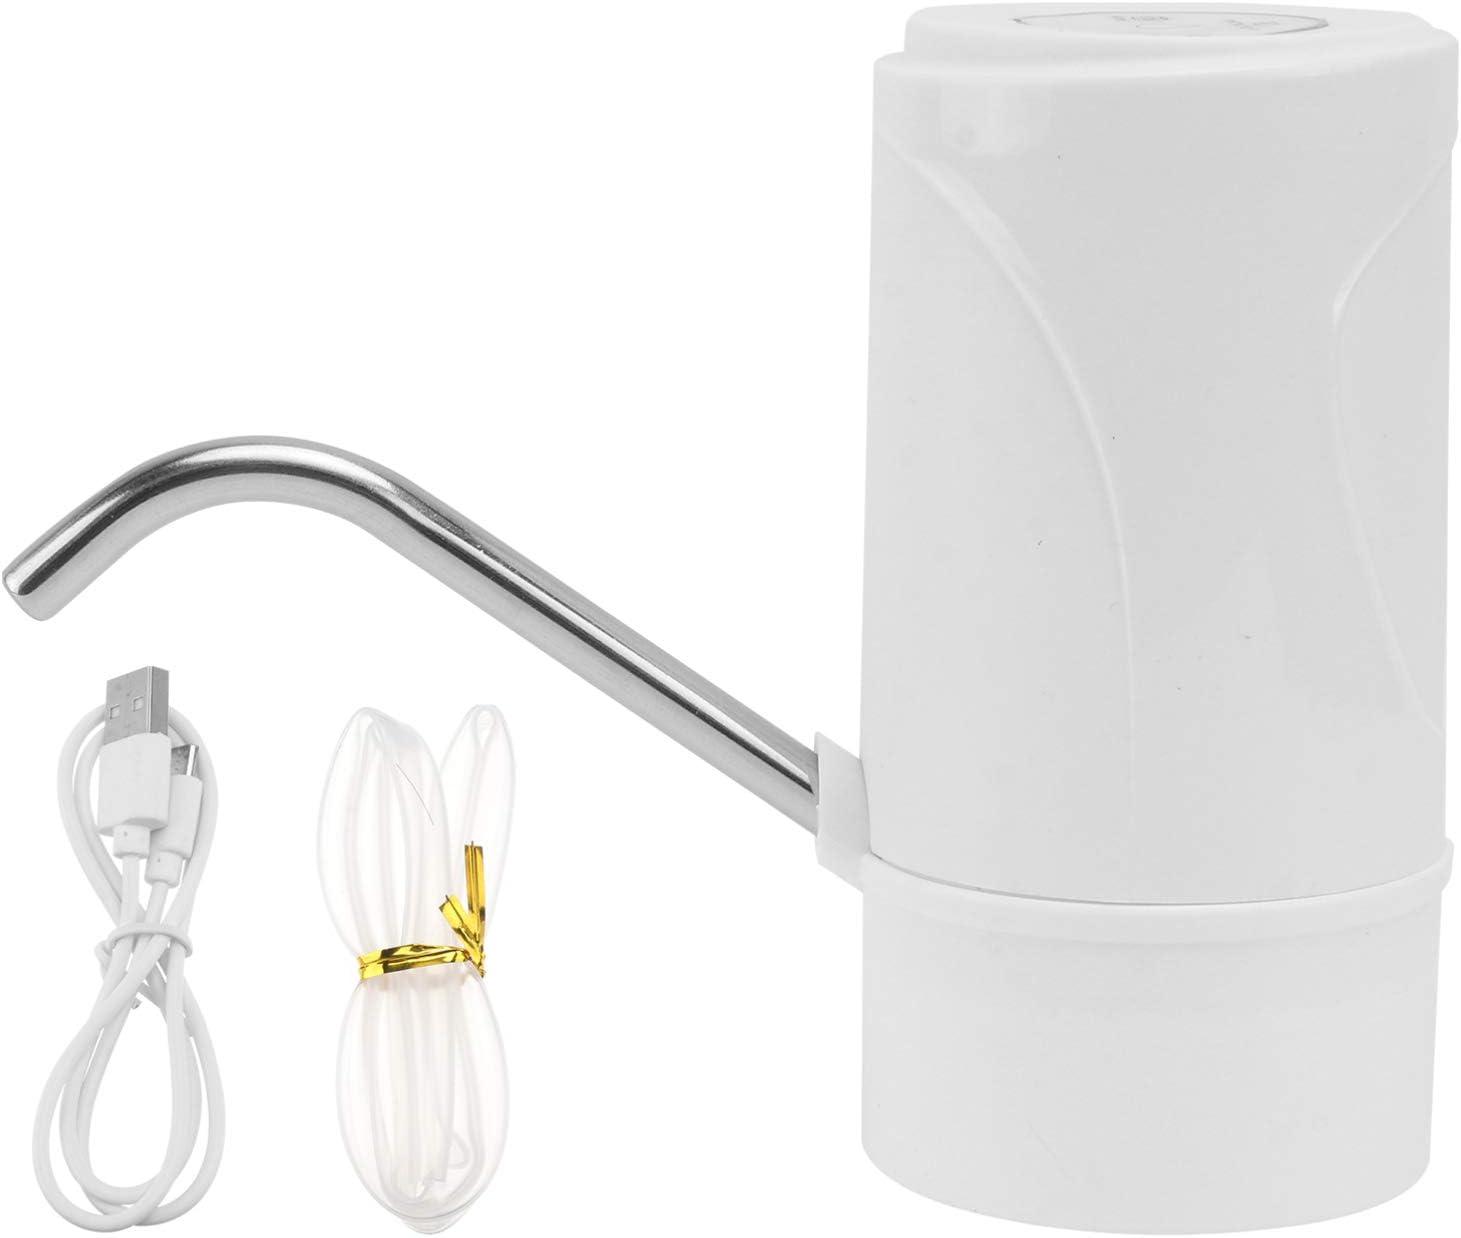 Atlanta Max 60% OFF Mall WINOMO Drinking Water Pump Autom Portable Dispenser Bottle